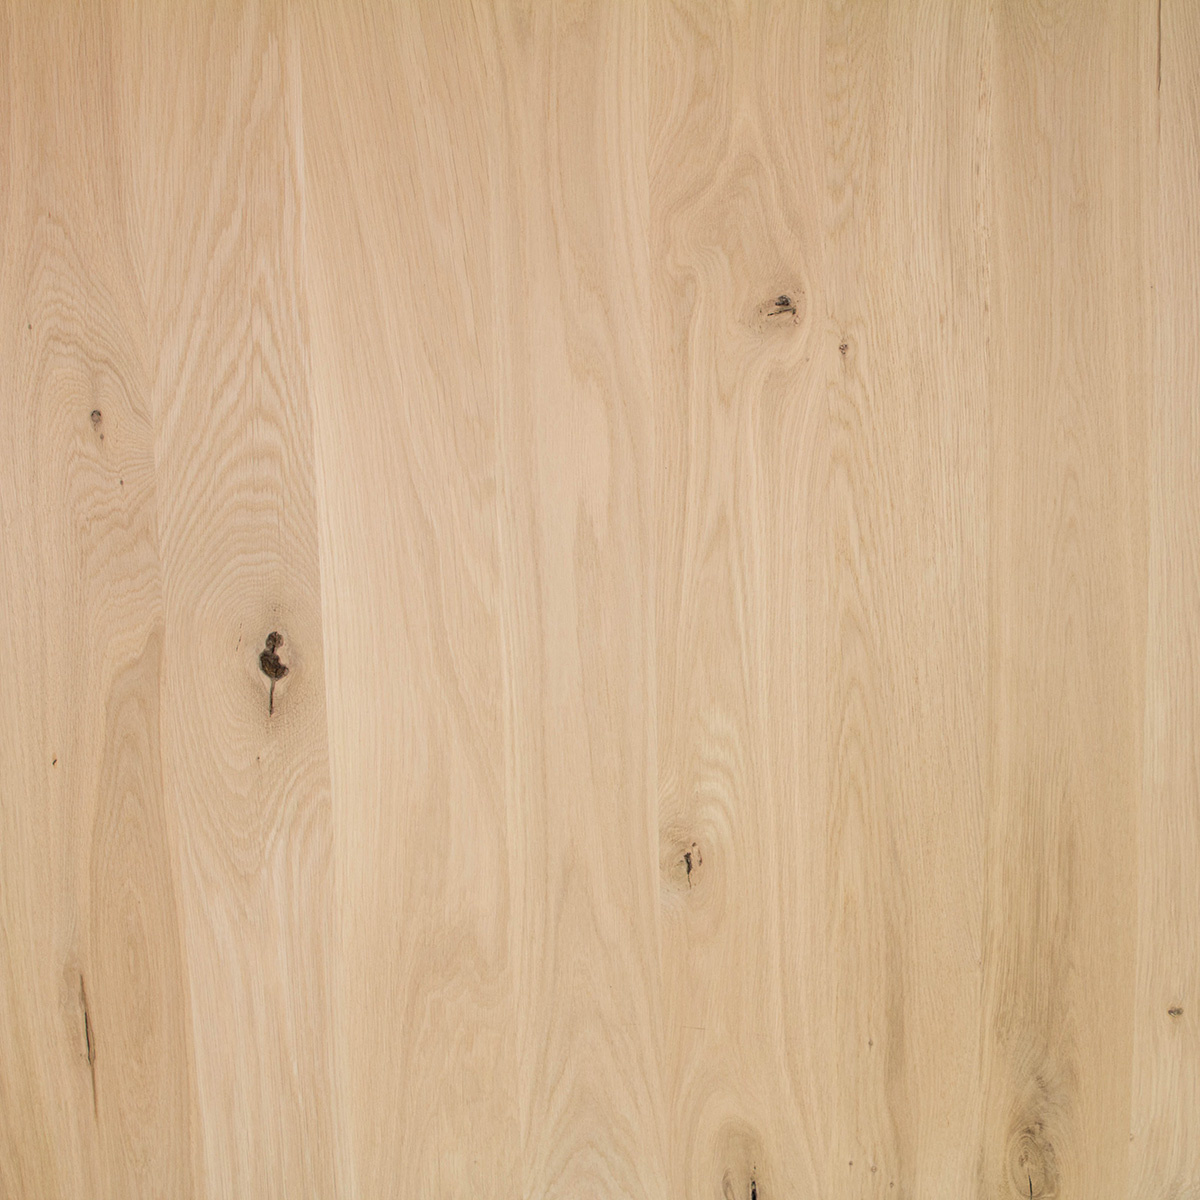 Arbeitsplatte Eiche massiv - 3 cm dick - 122x140-300 cm - Eichenholz rustikal - Massivholz - Verleimt & künstlich getrocknet (HF 8-12%)